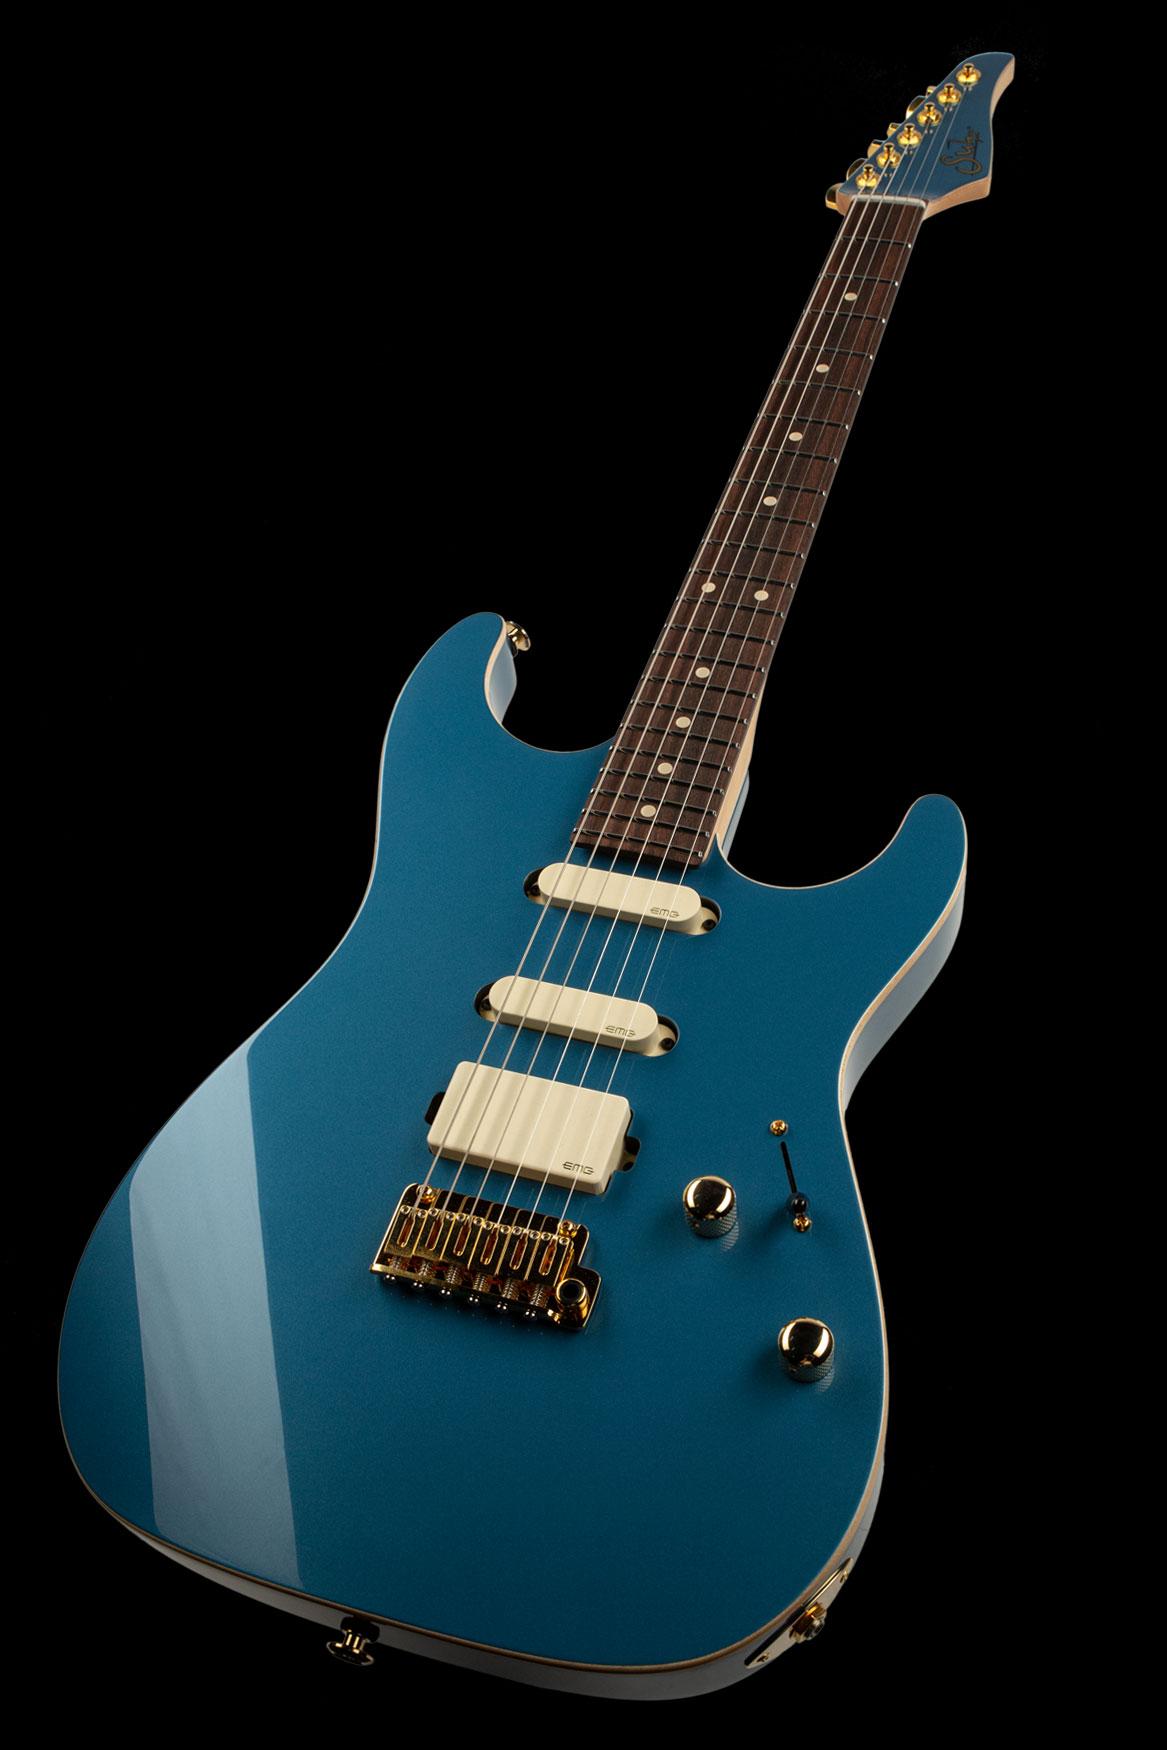 01-LTD-0019: Standard Legacy, Pelham Blue, Gotoh 510